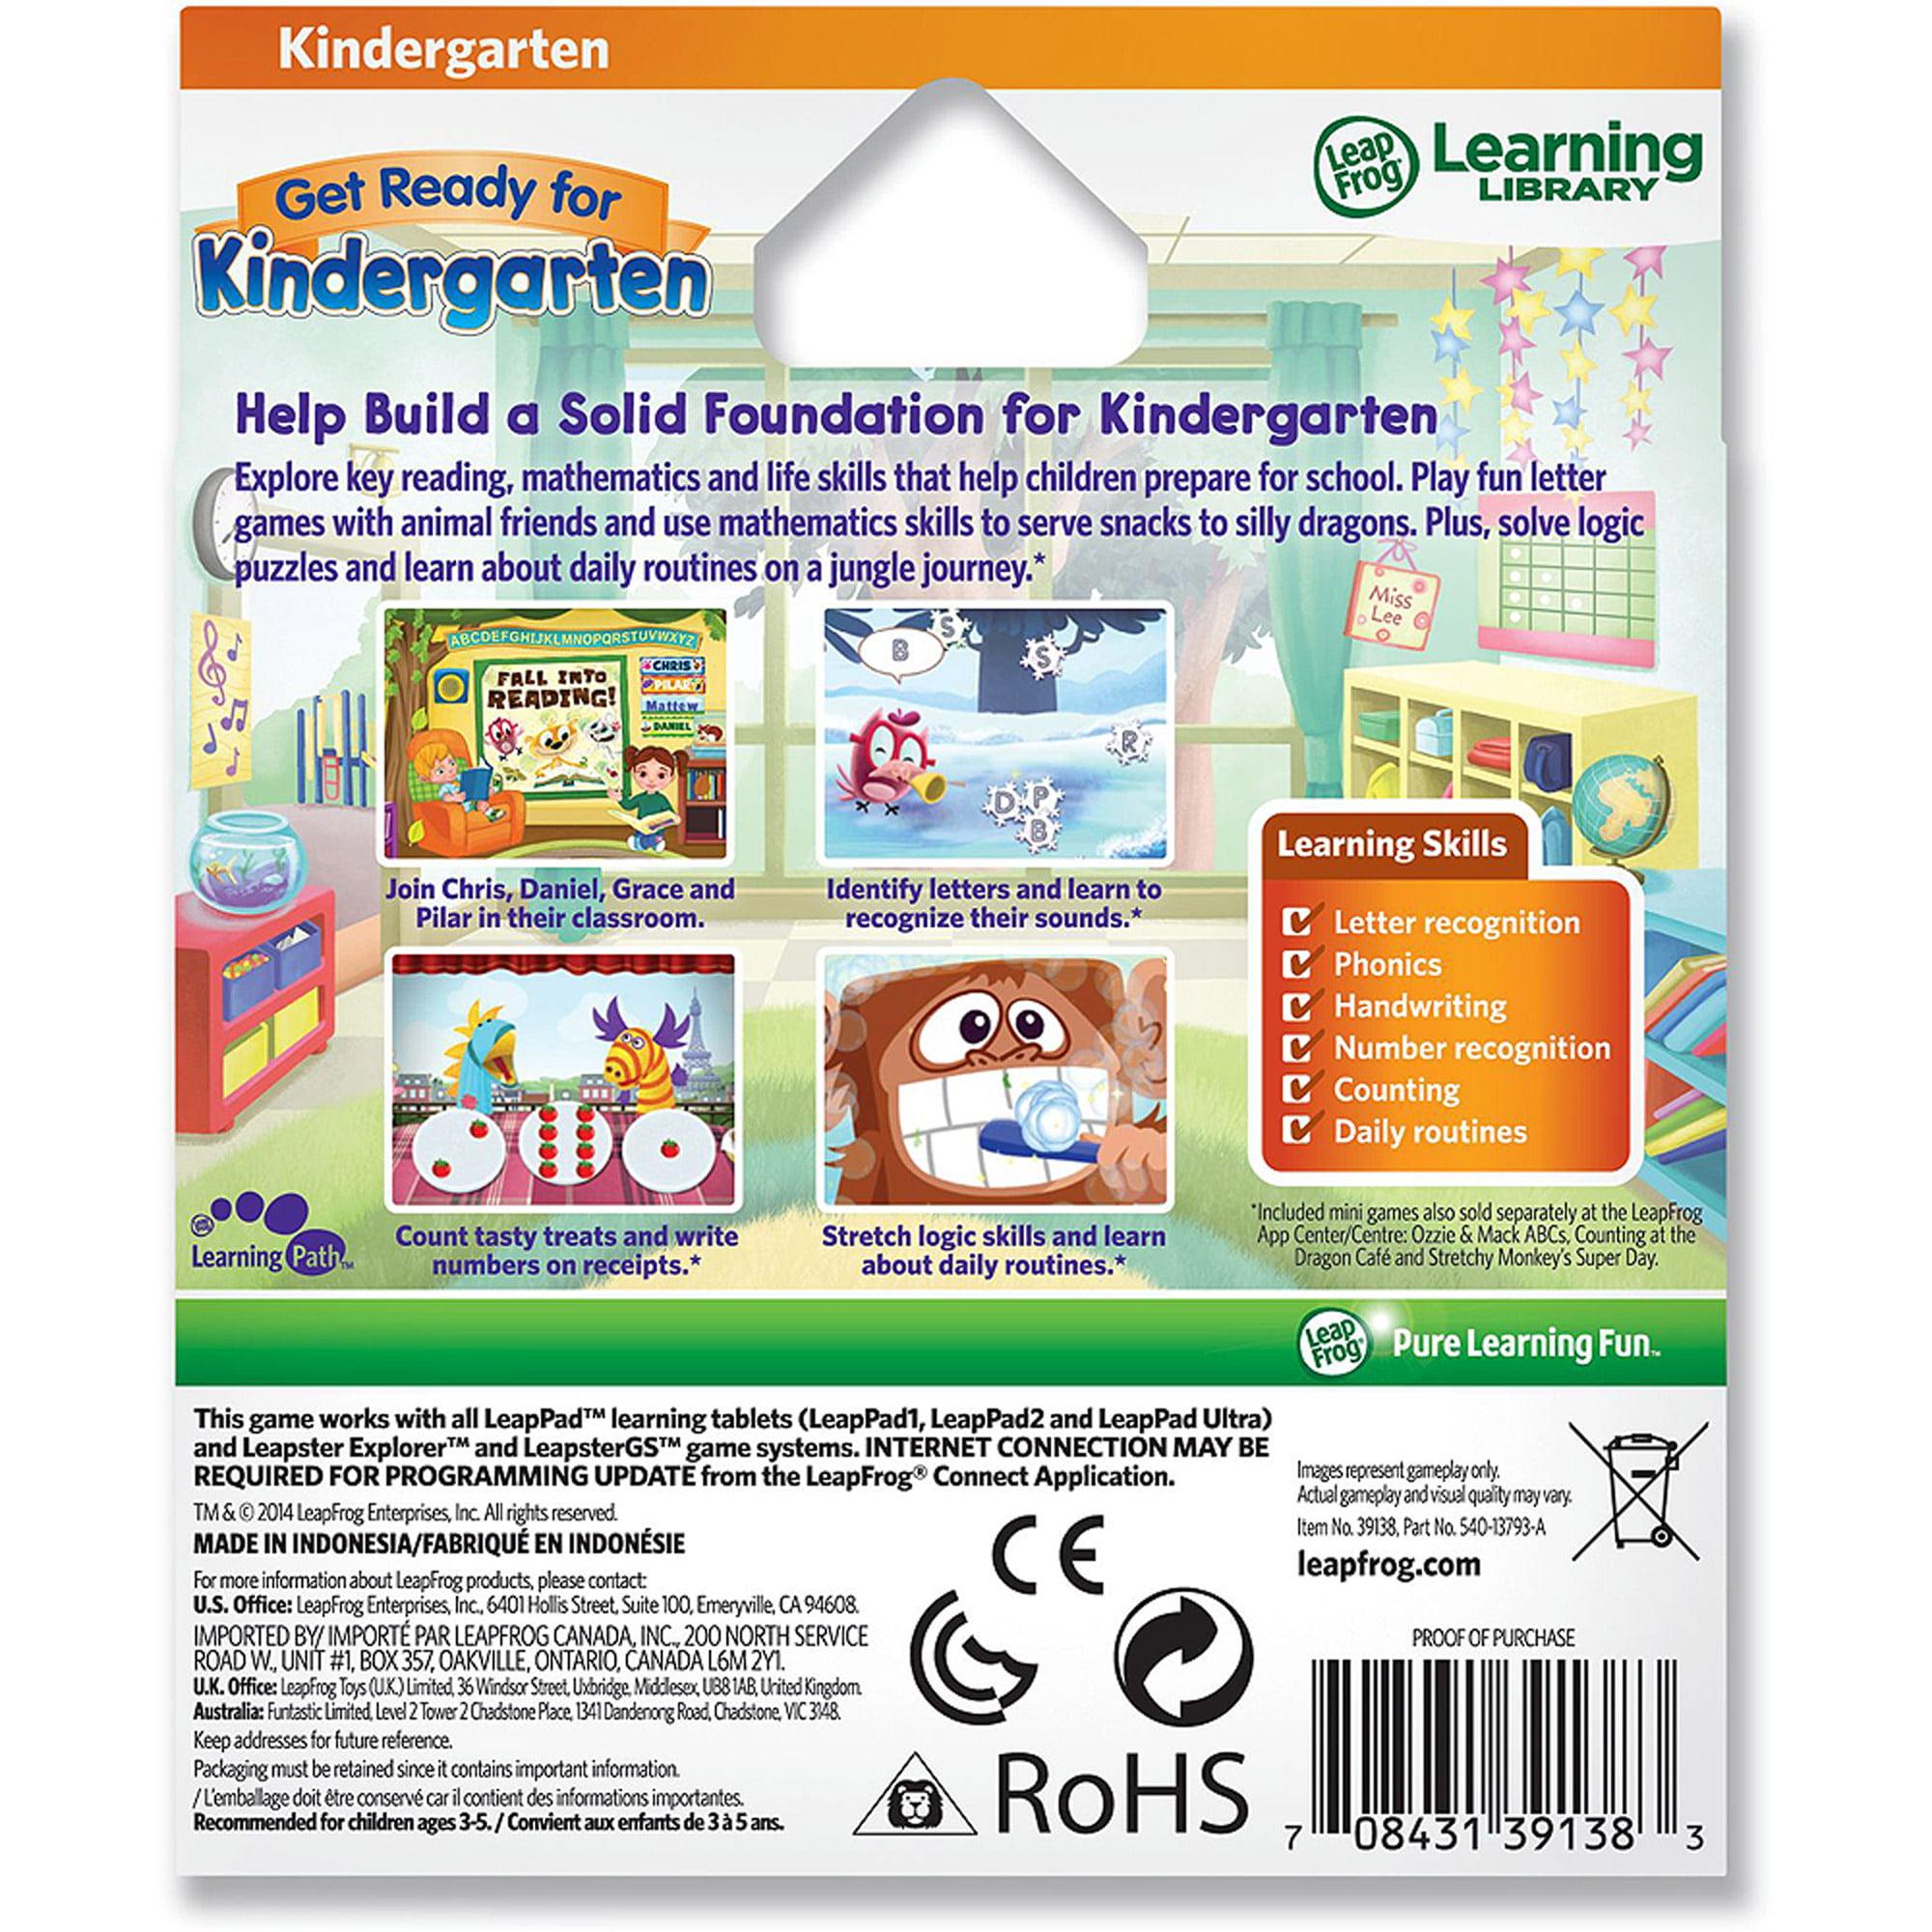 LeapFrog Enterprises Get Ready Kindergarten Game Pk Walmart